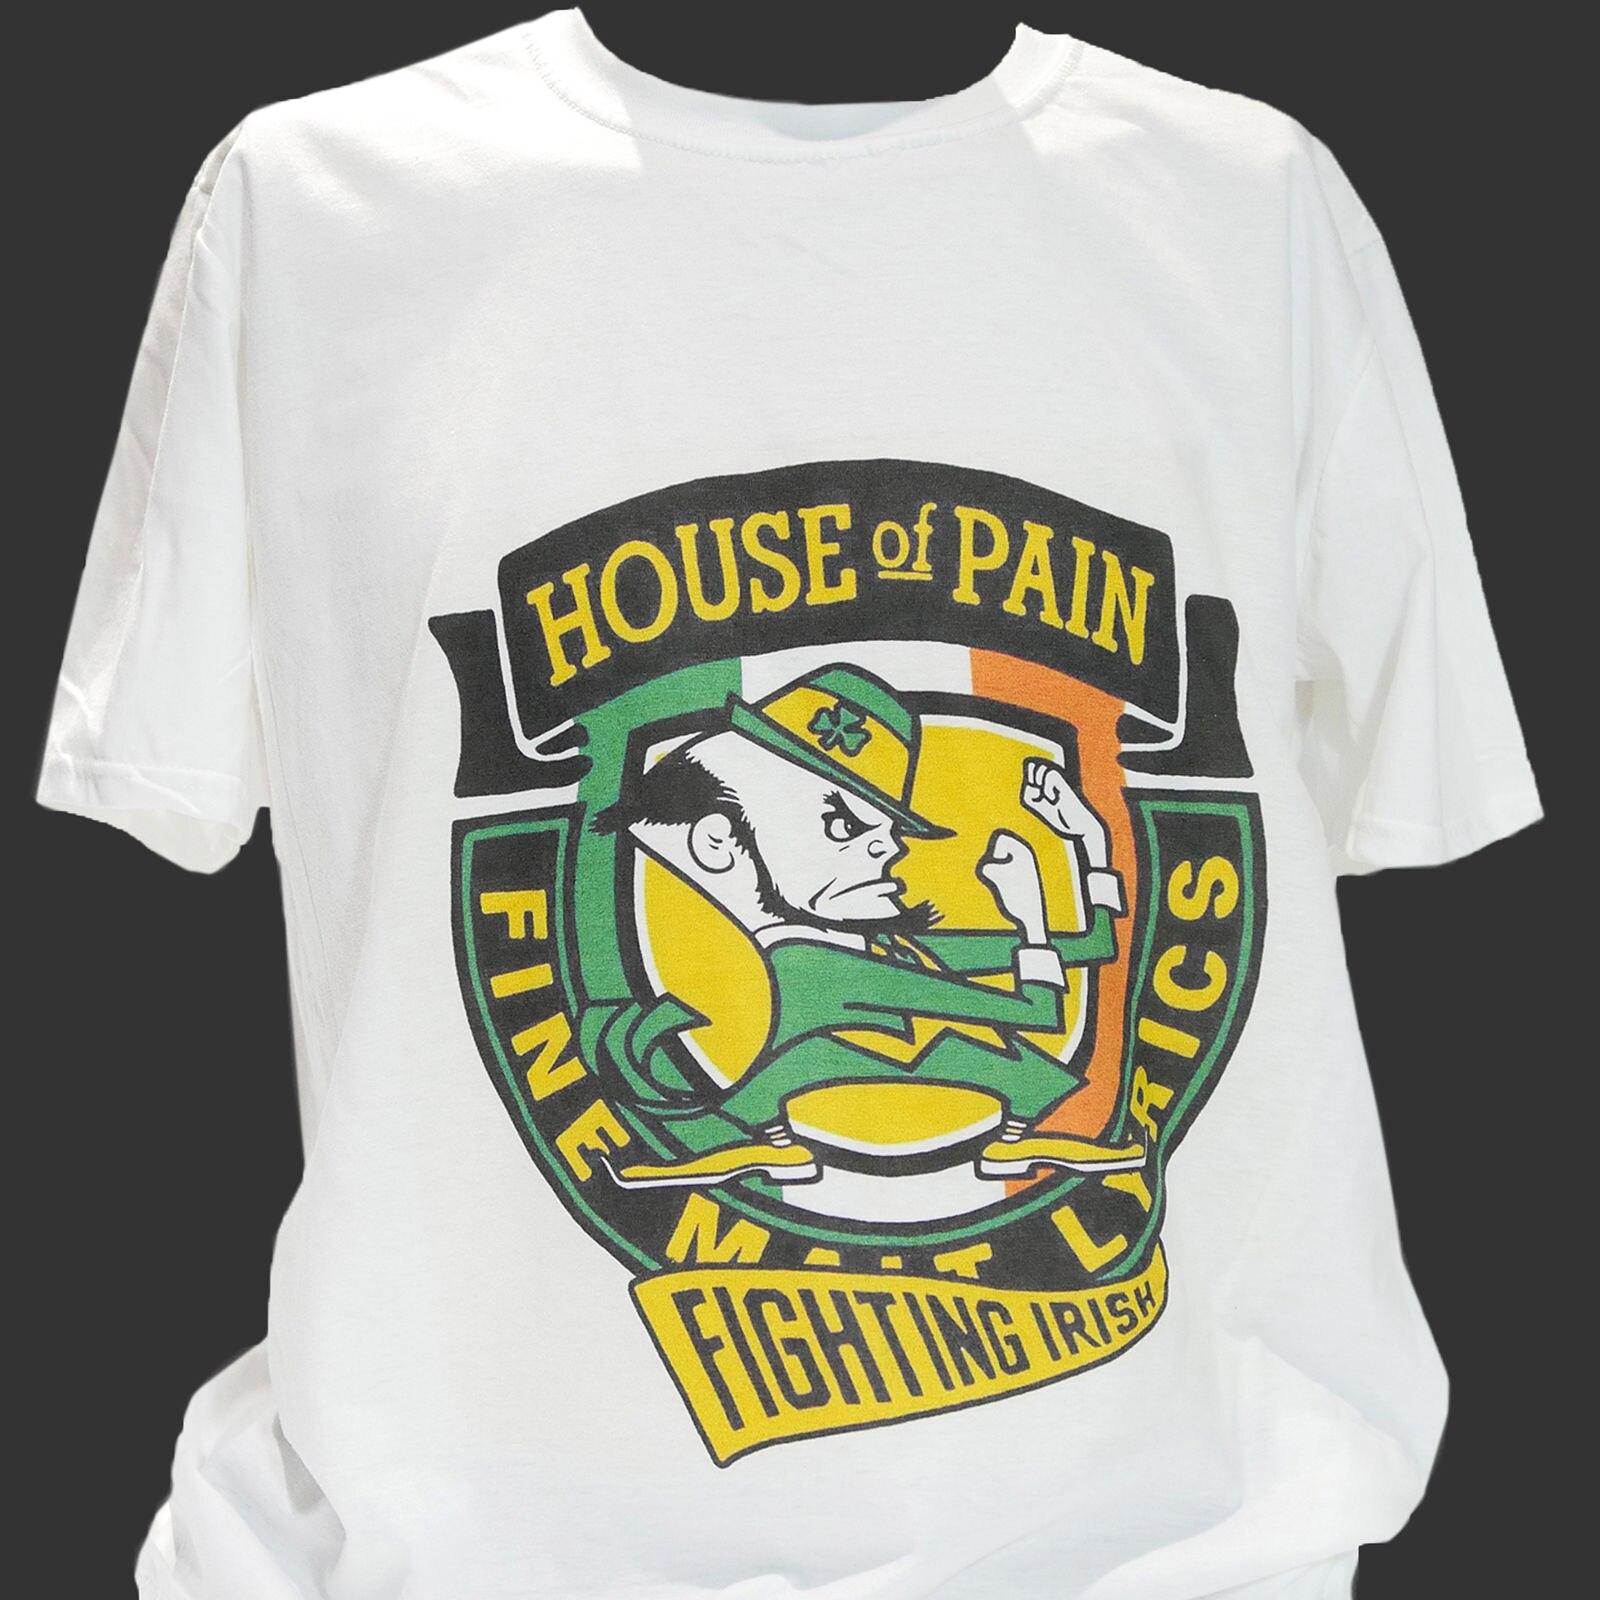 HOUSE OF PAIN FINE MALT LYRICS EVERLAST DJ LETHAL CYPRESS HILL NEW WHITE T-SHIRT